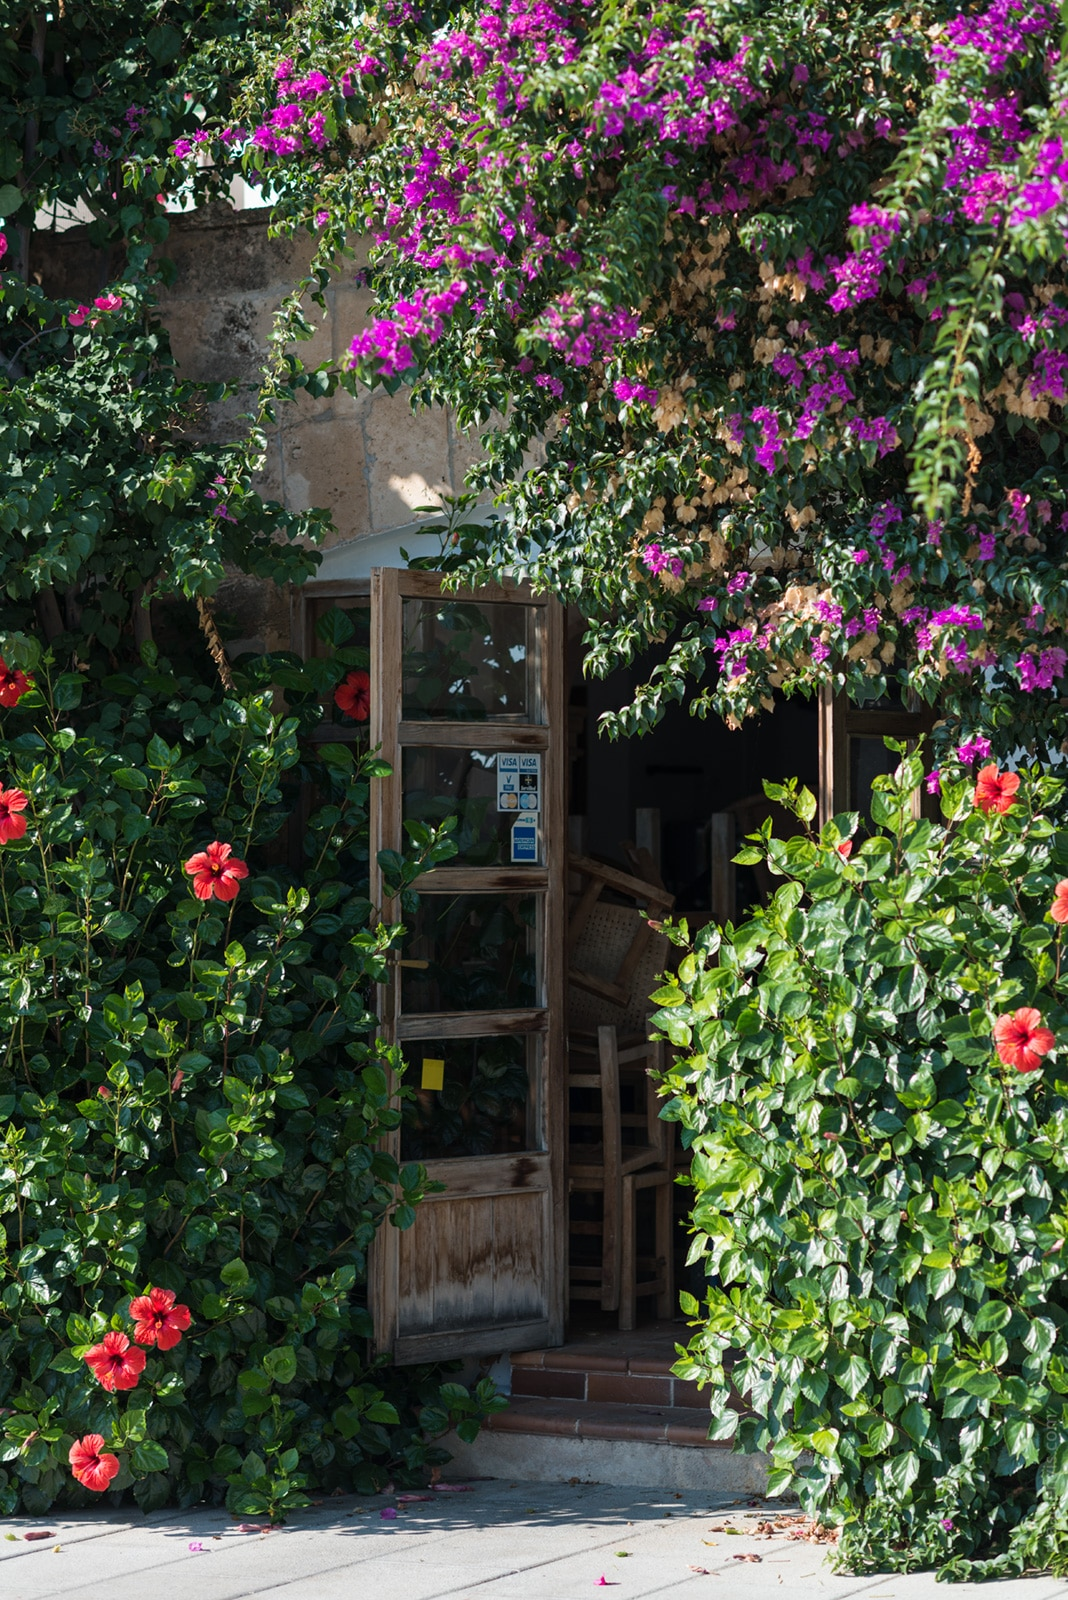 20161003 3464 - Mallorca in Spring